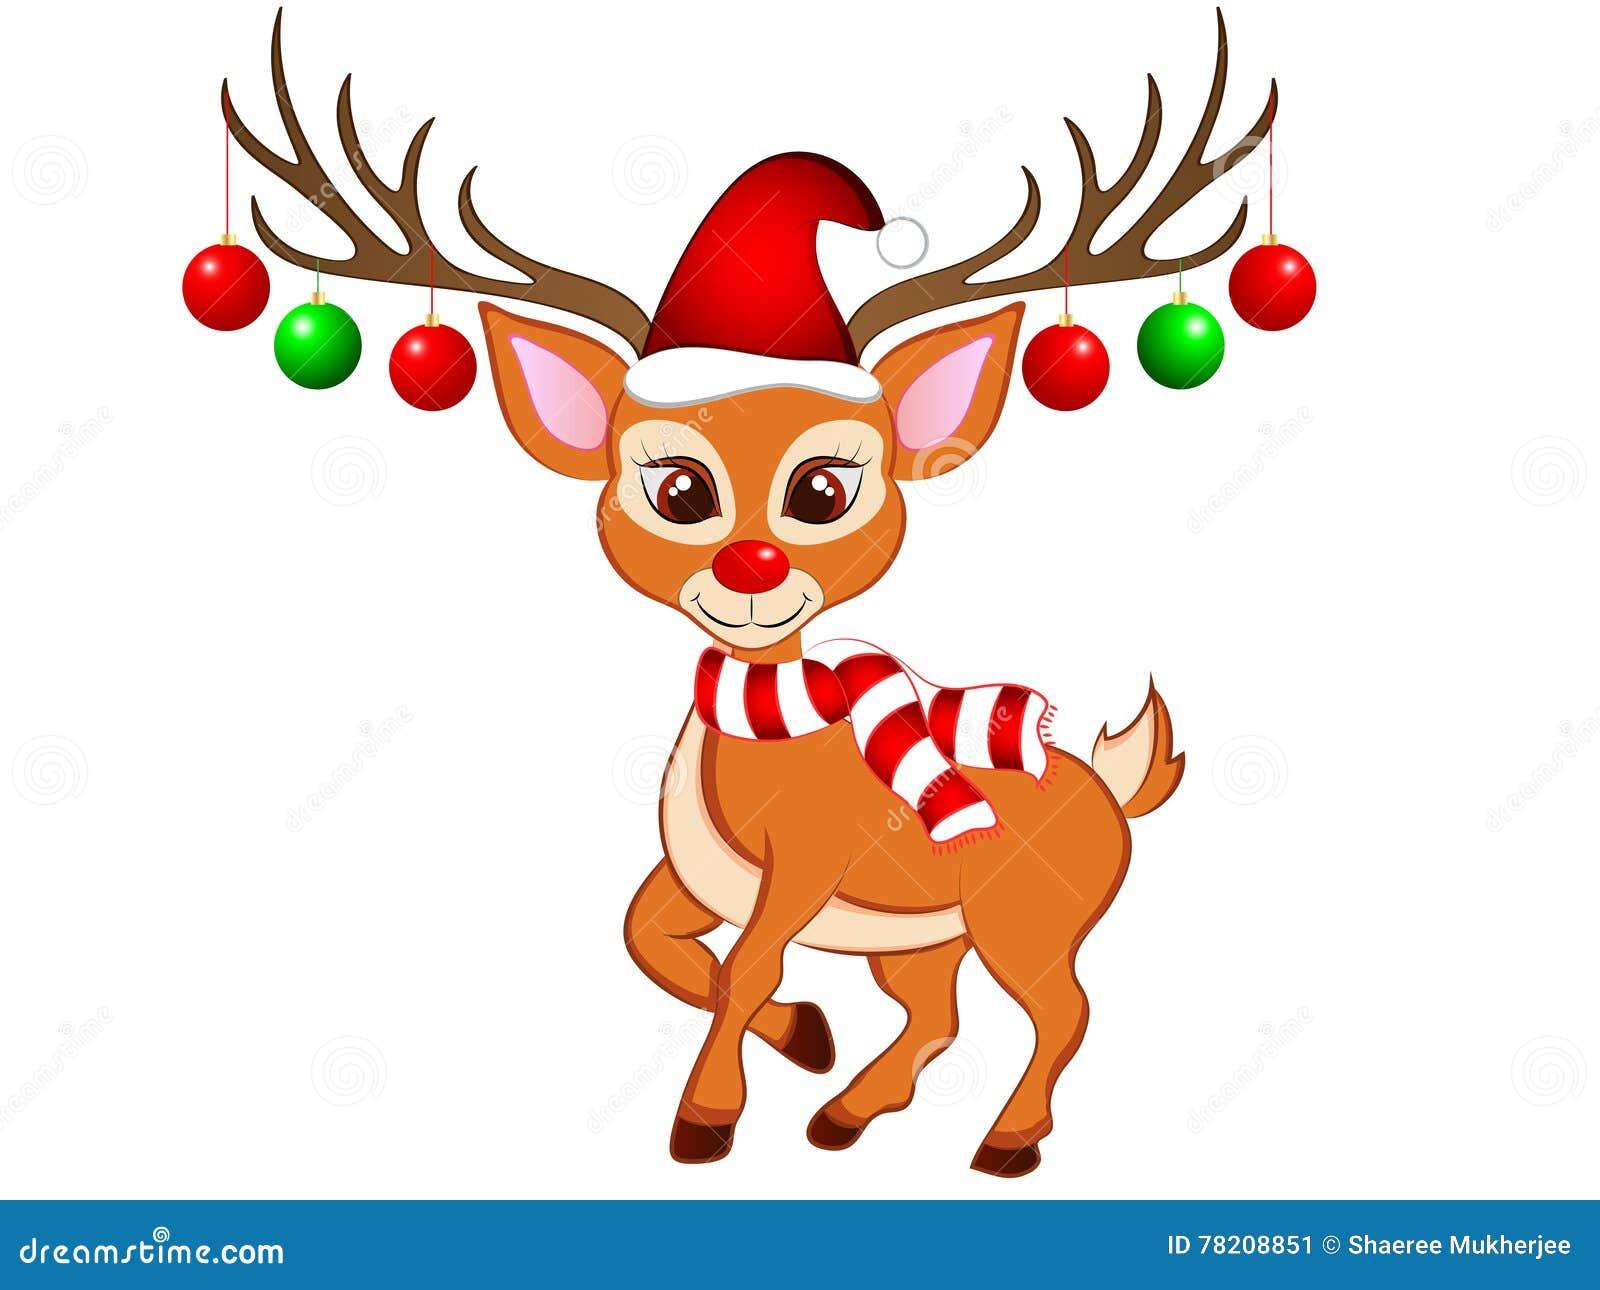 New Christmas Reindeer Clip Art